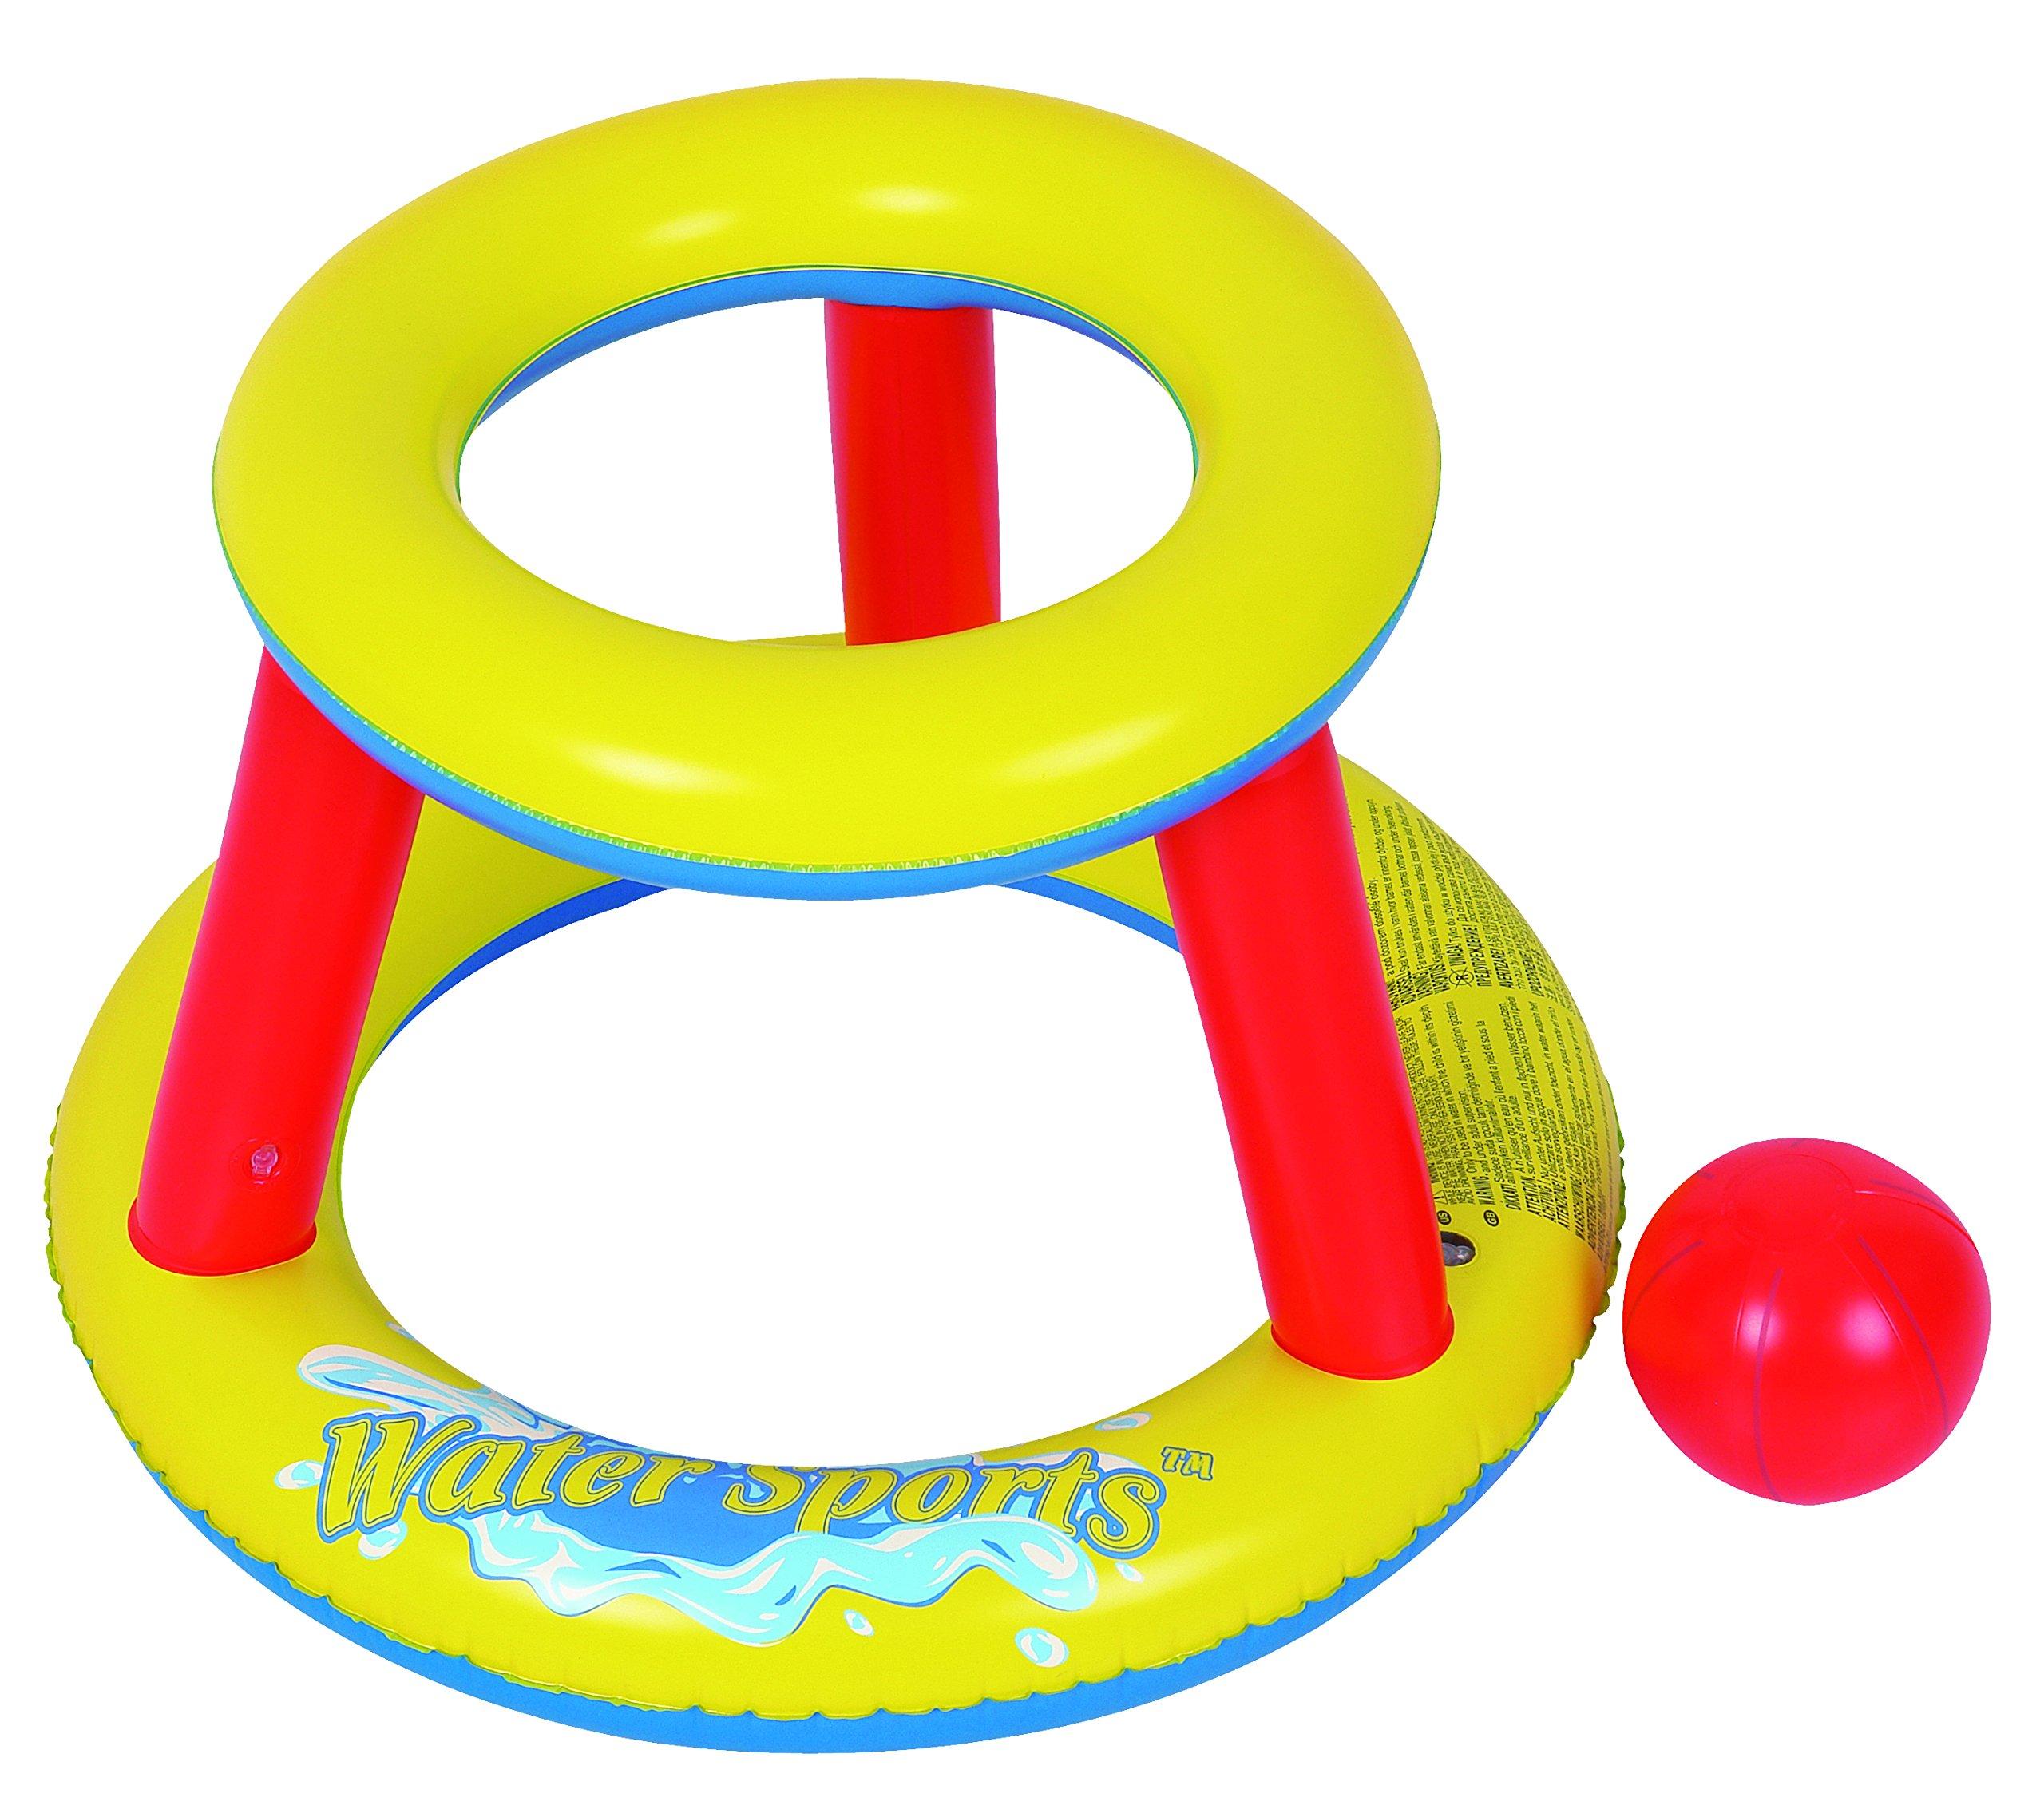 RhinoMaster Play Mini Splashketball Pool Basketball, Yellow, Red, 29'' L x 29'' W x 20.5'' H